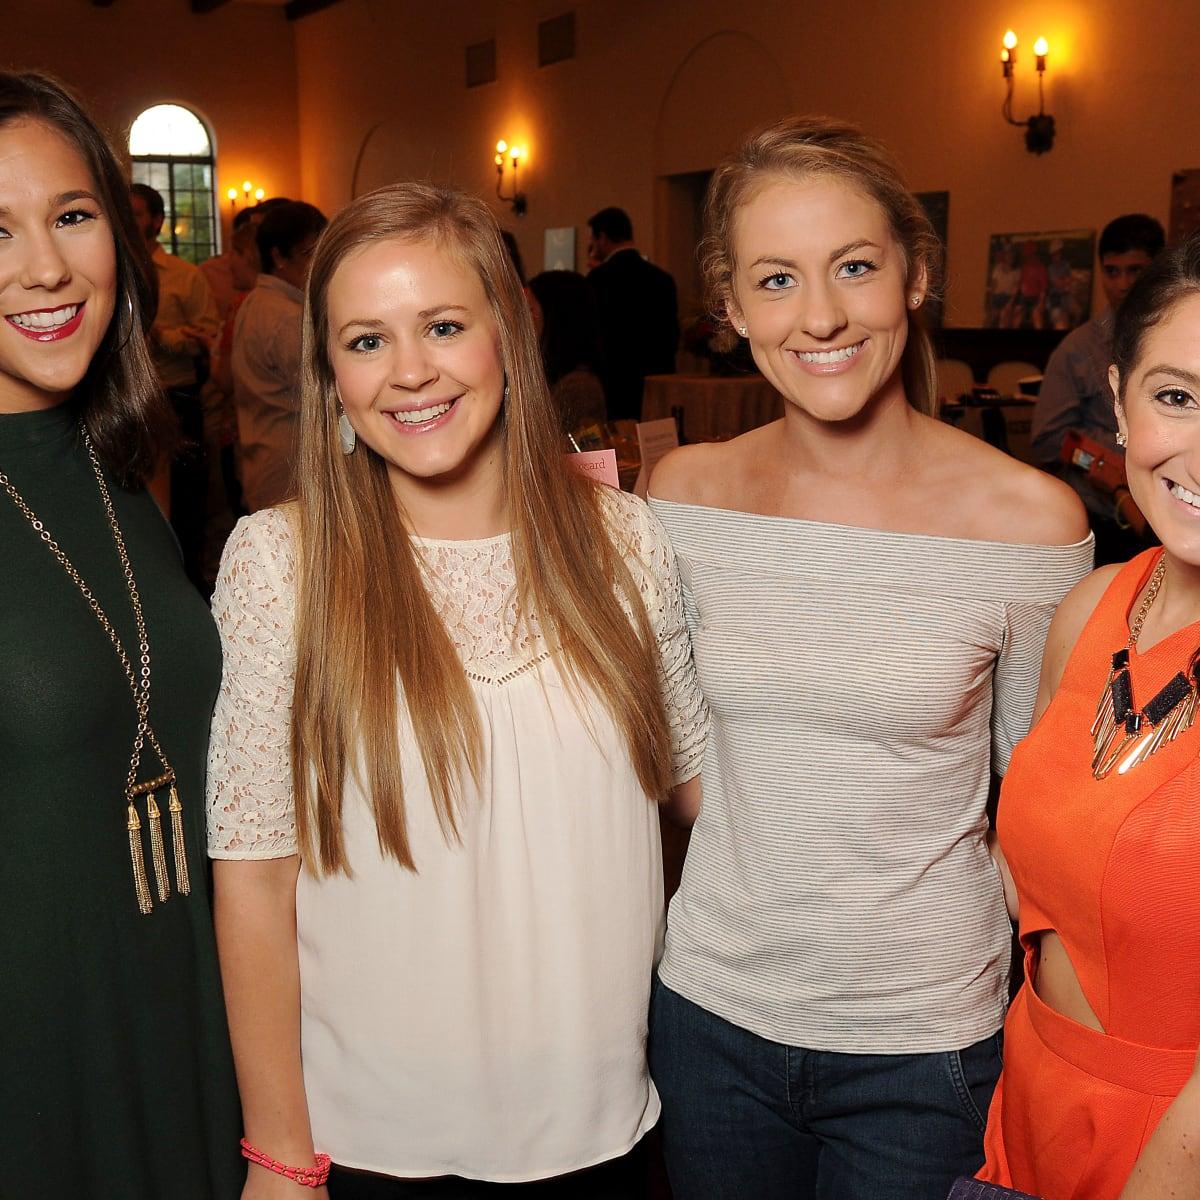 News, Shelby, Camp for All Camp Culinary, Sept. 2015, Julie Marin, Aimee Putnam, Lucy Moffitt, Beth Davis